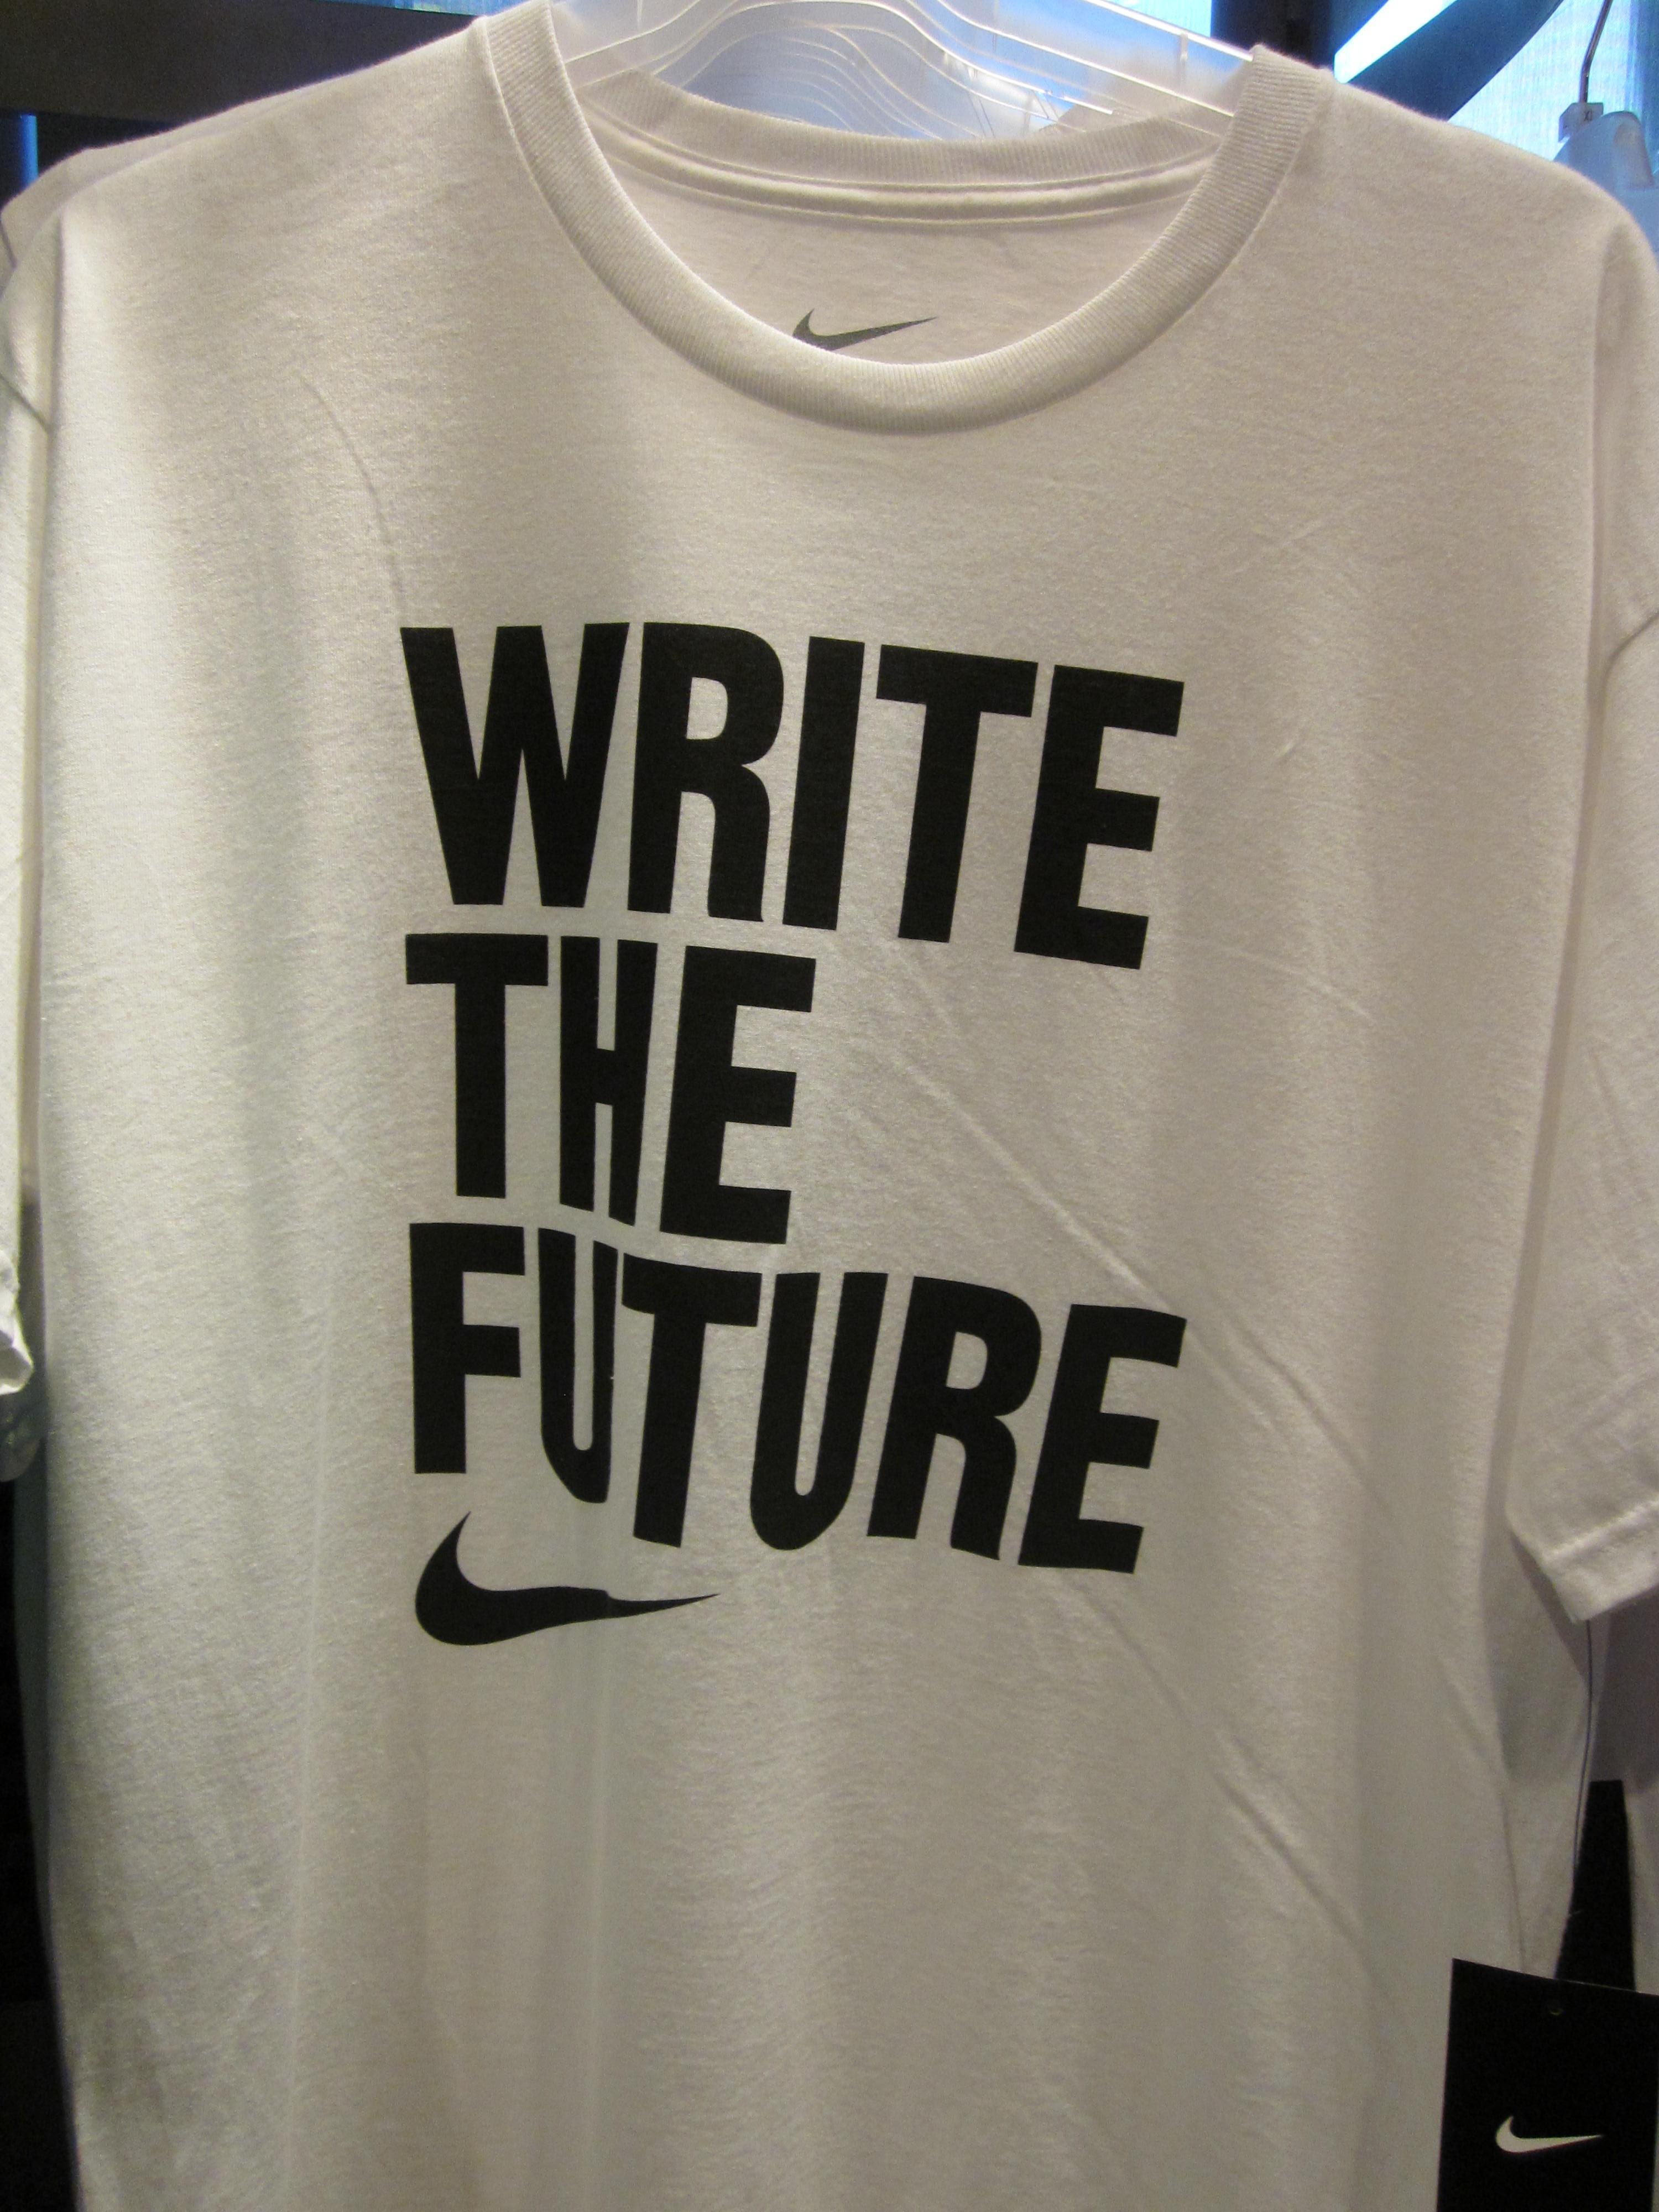 info for 36c26 88542 File Nike Write the Future soccer shirt.JPG